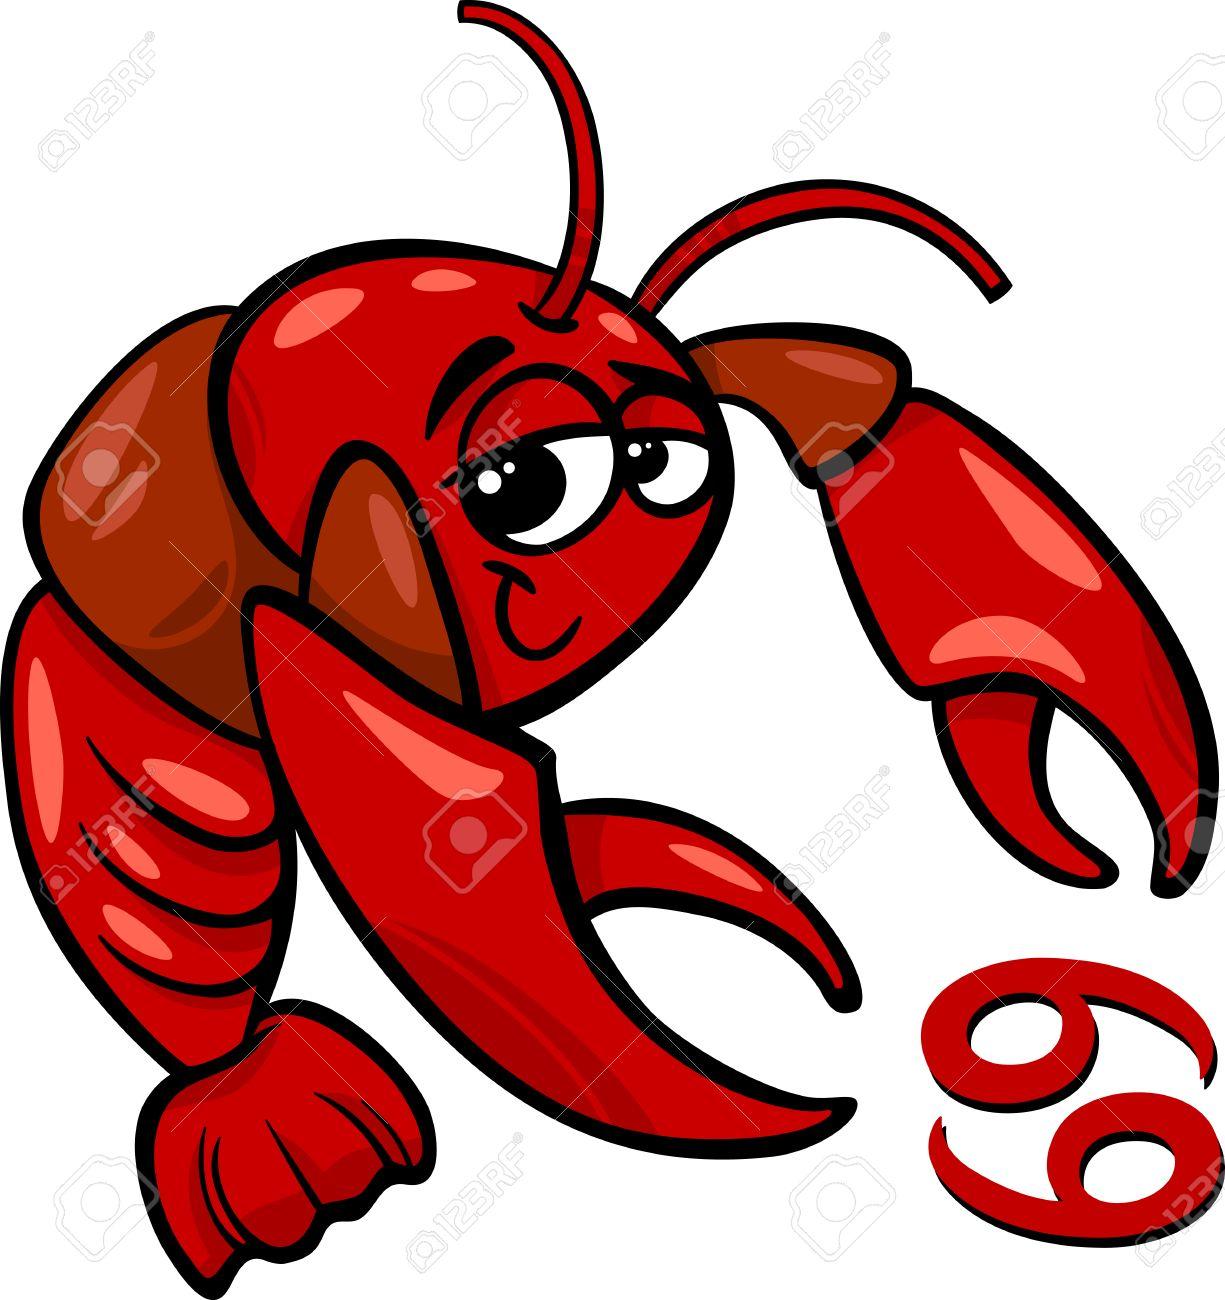 Crawfish Boil Clipart